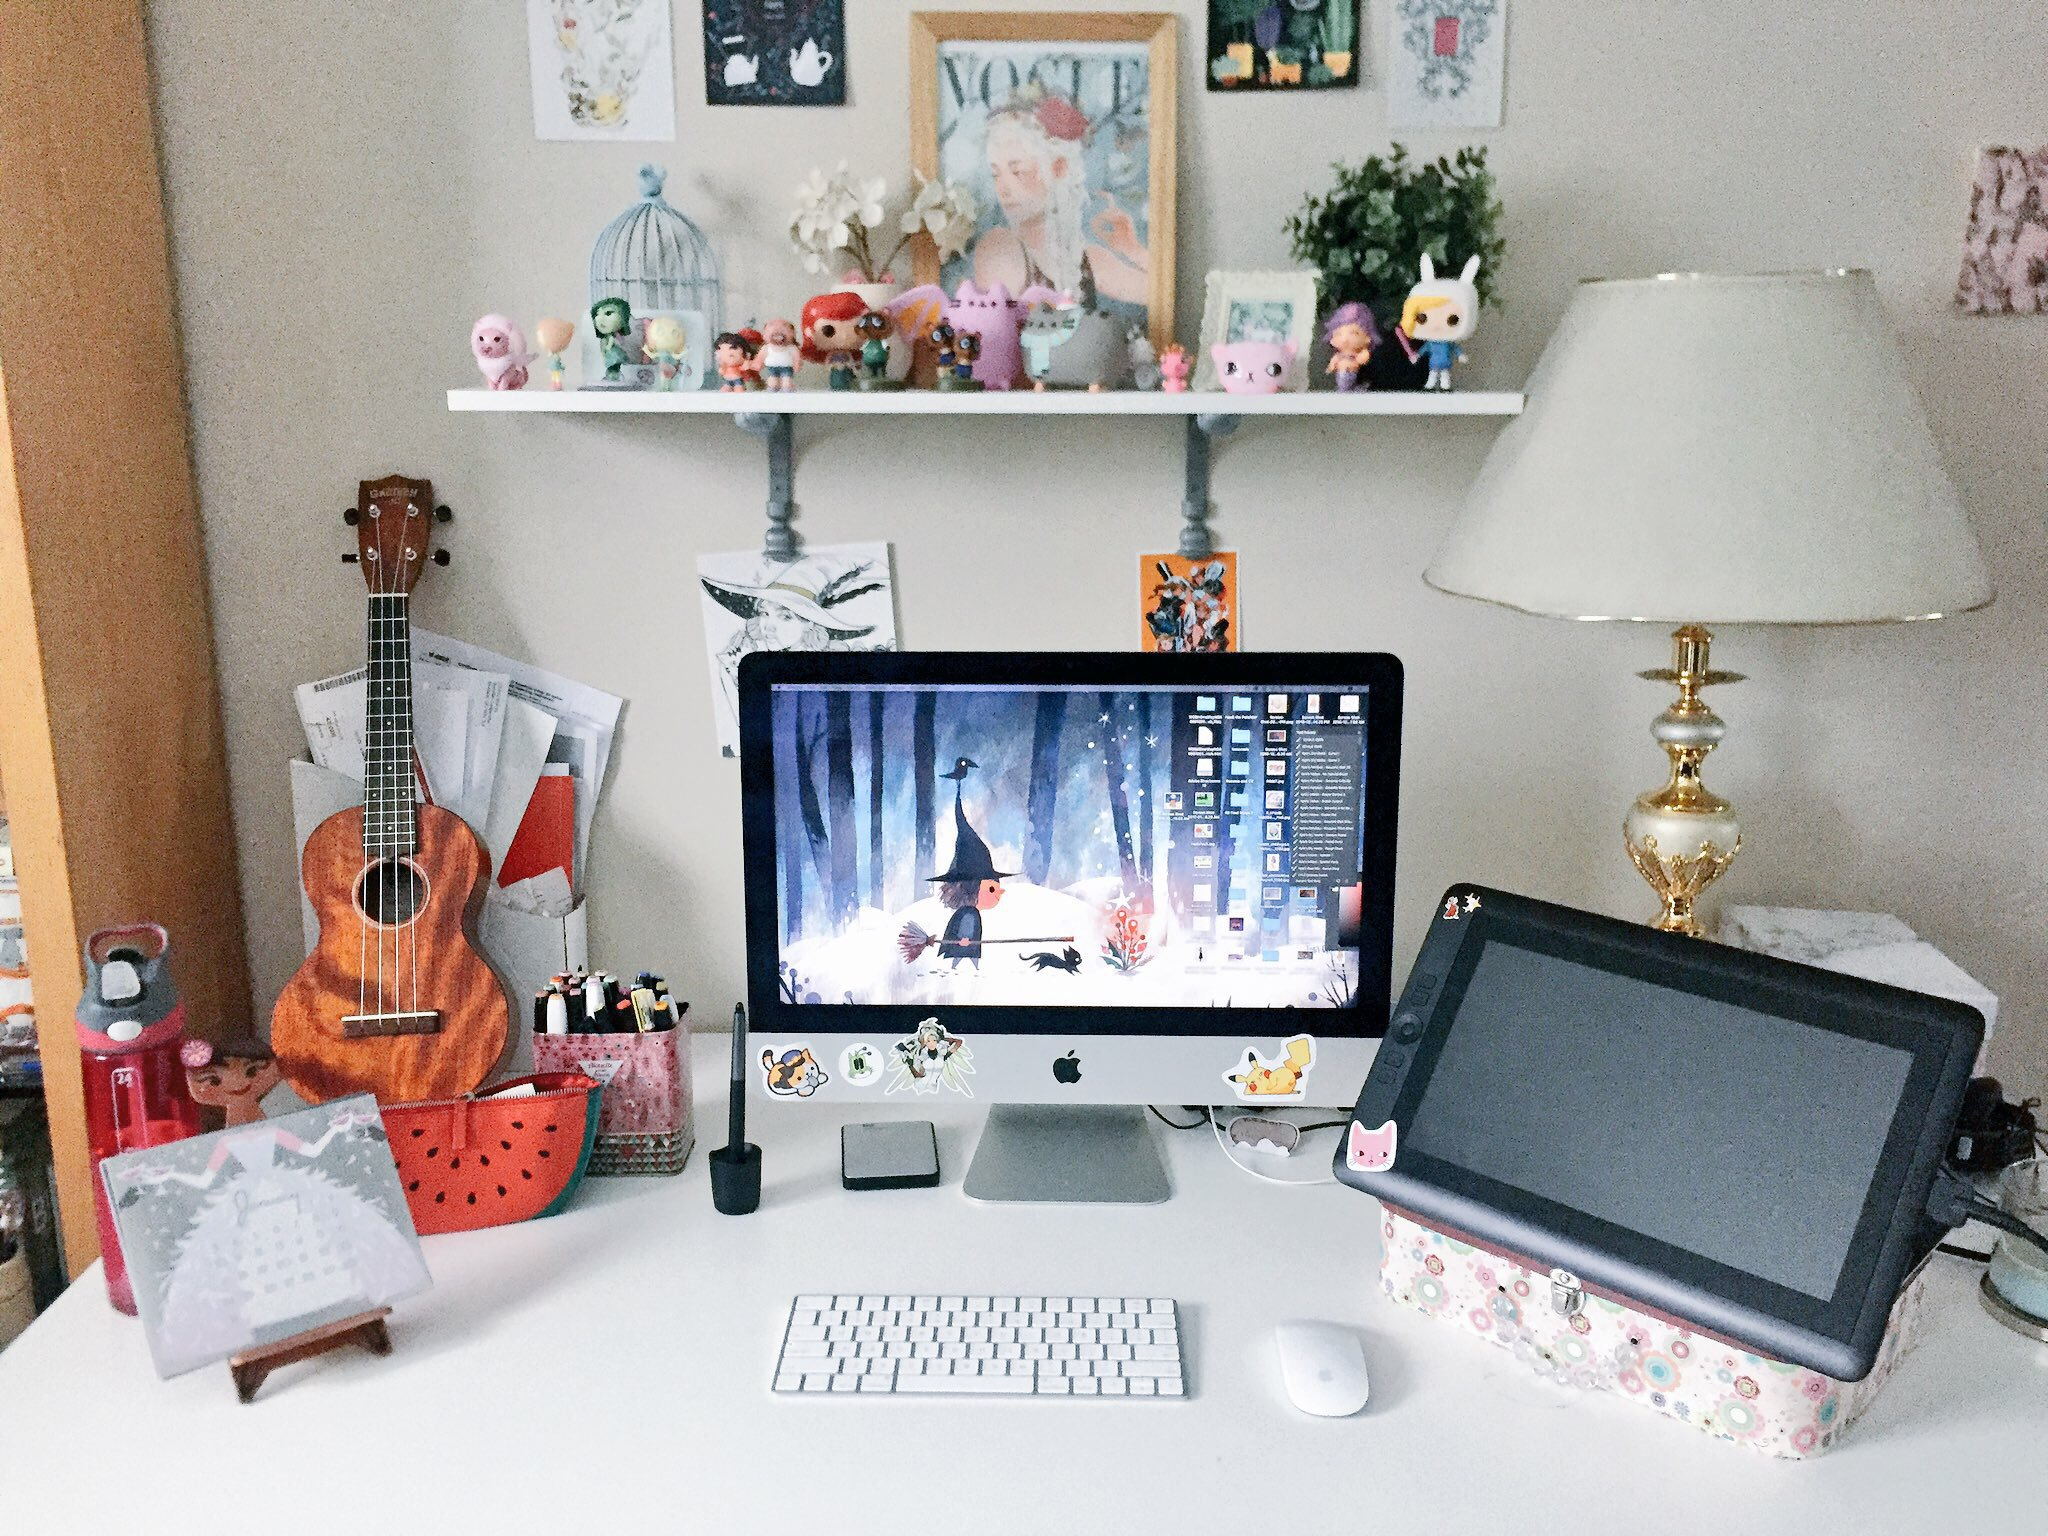 Anoosha's workspace